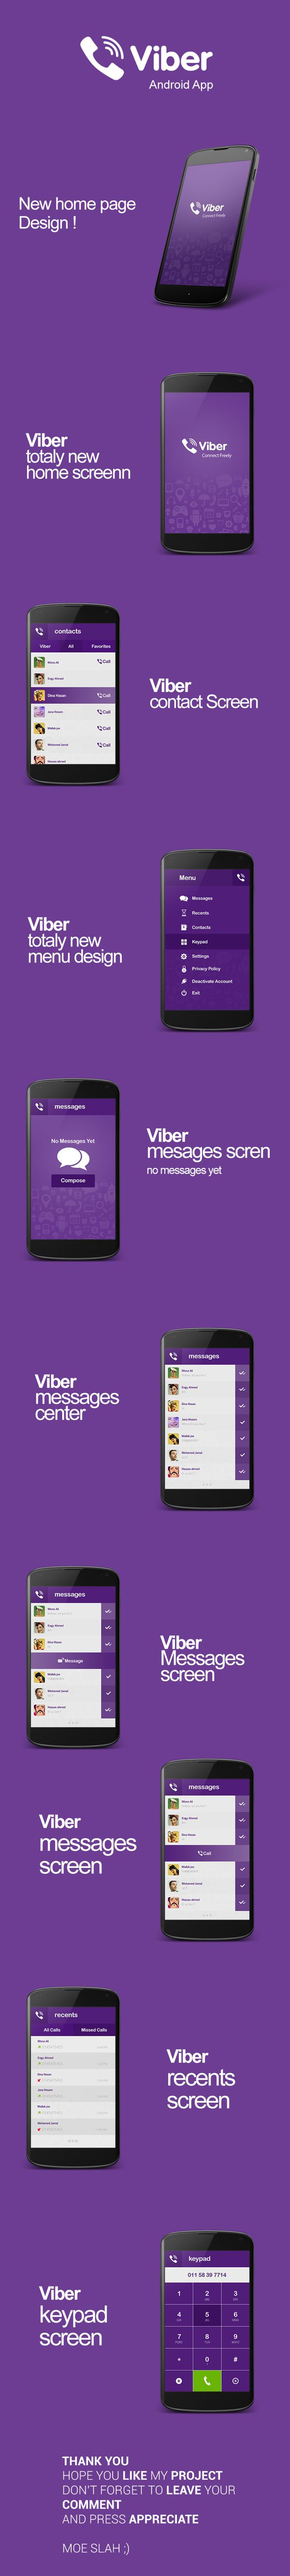 Viber Android app re-design